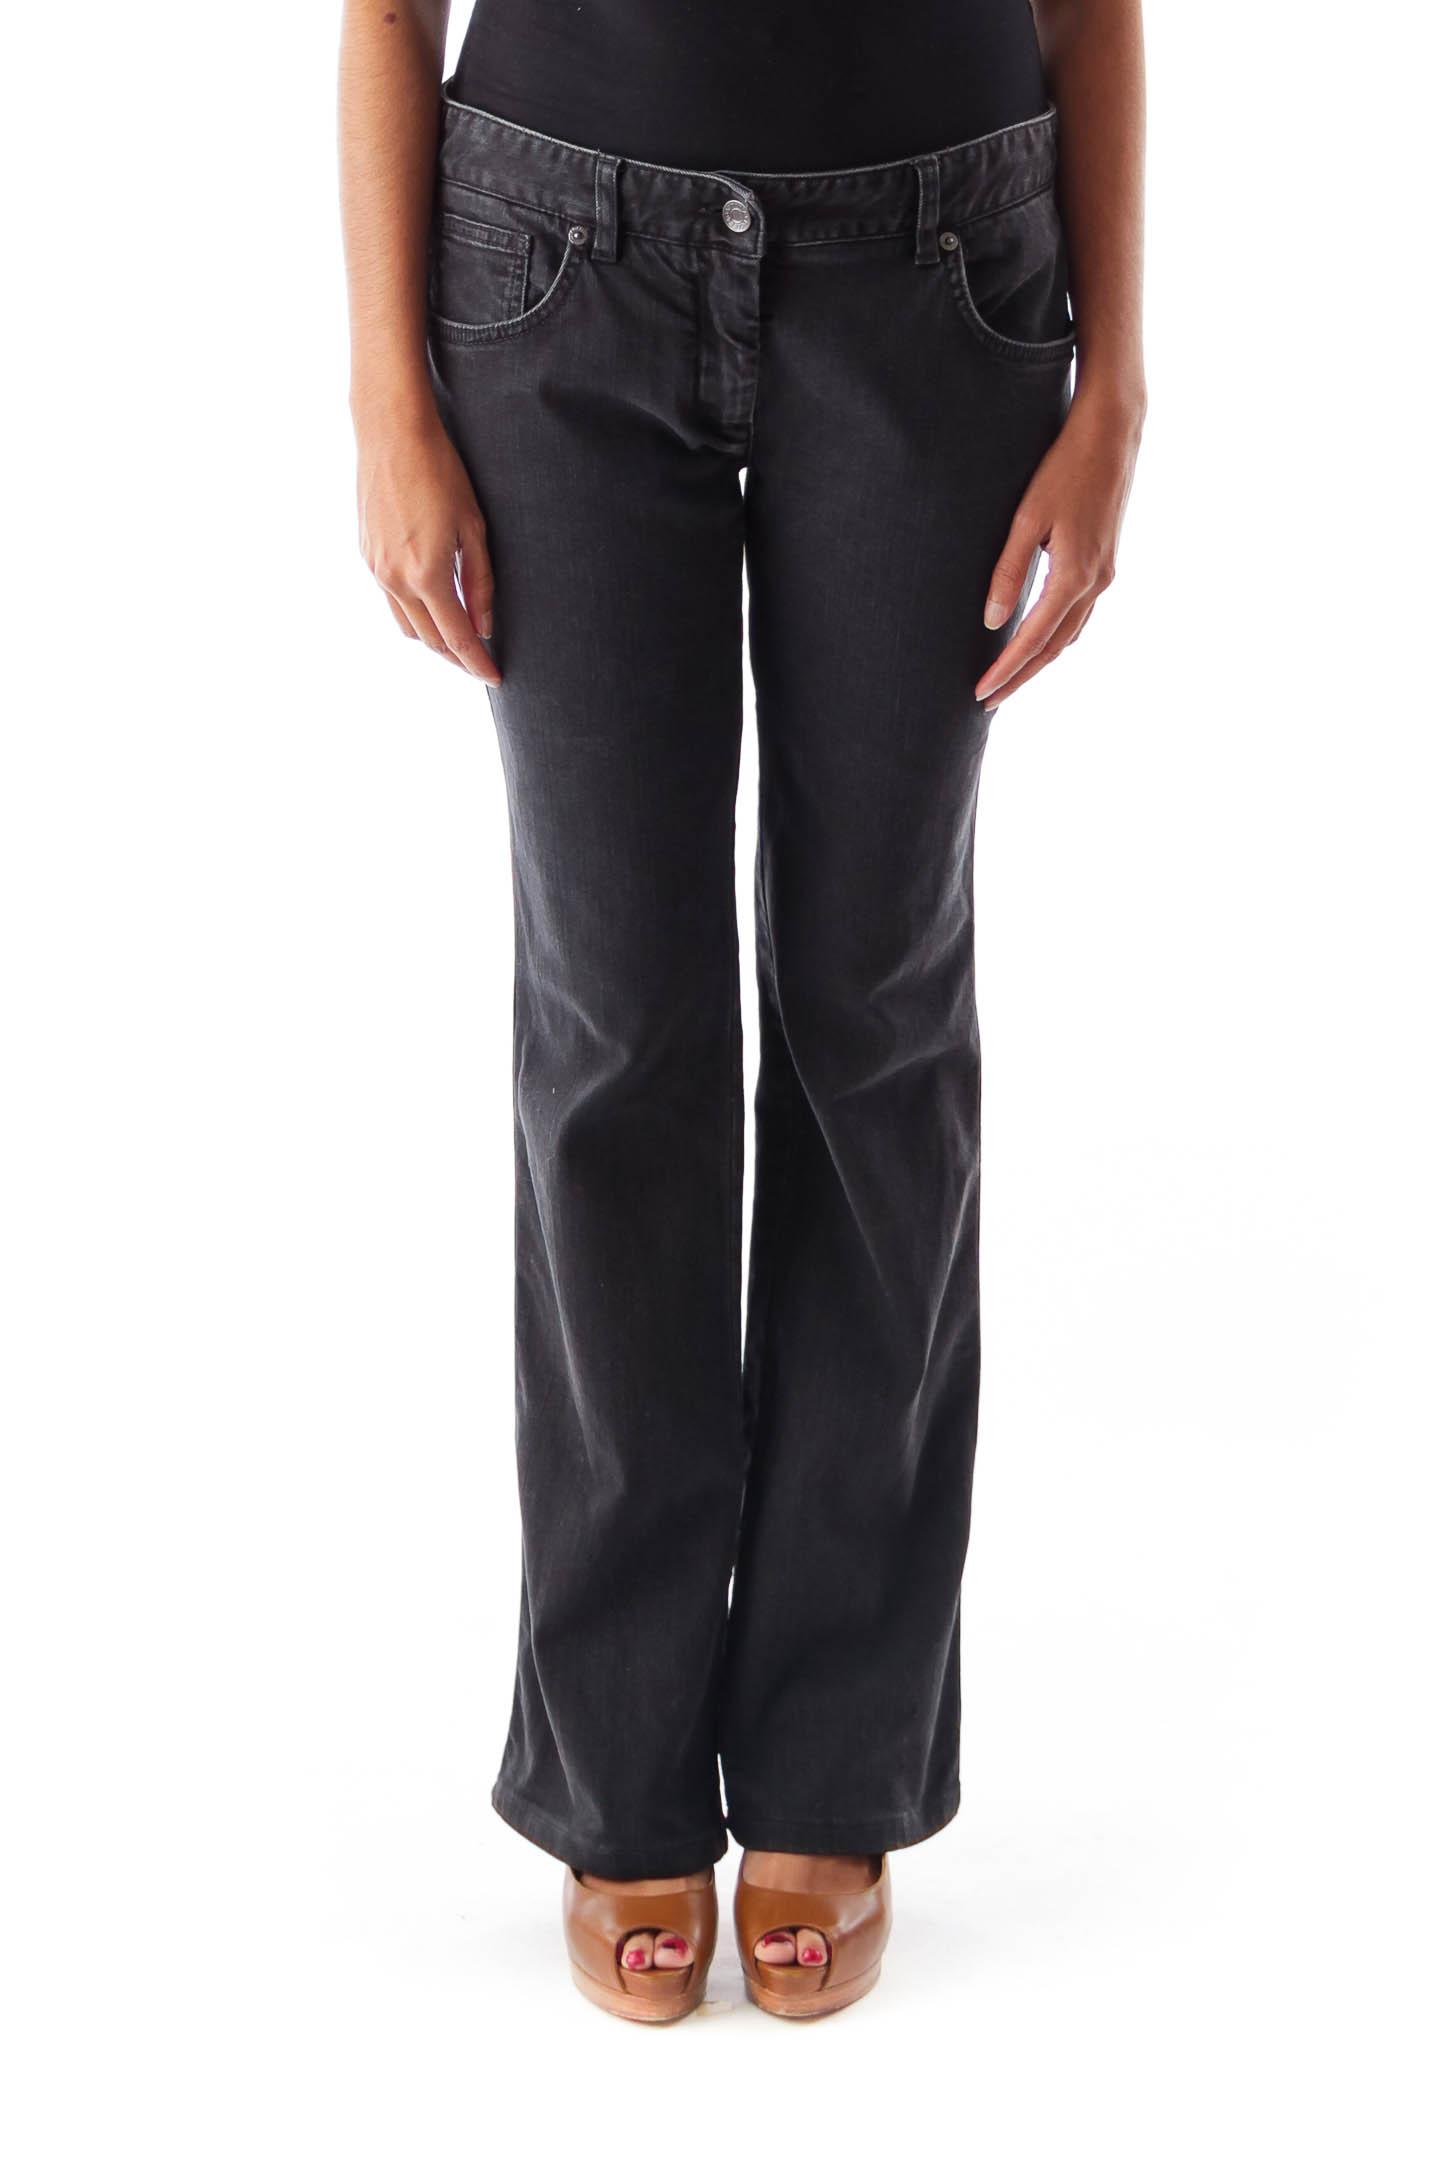 Black Flare Denim Pants